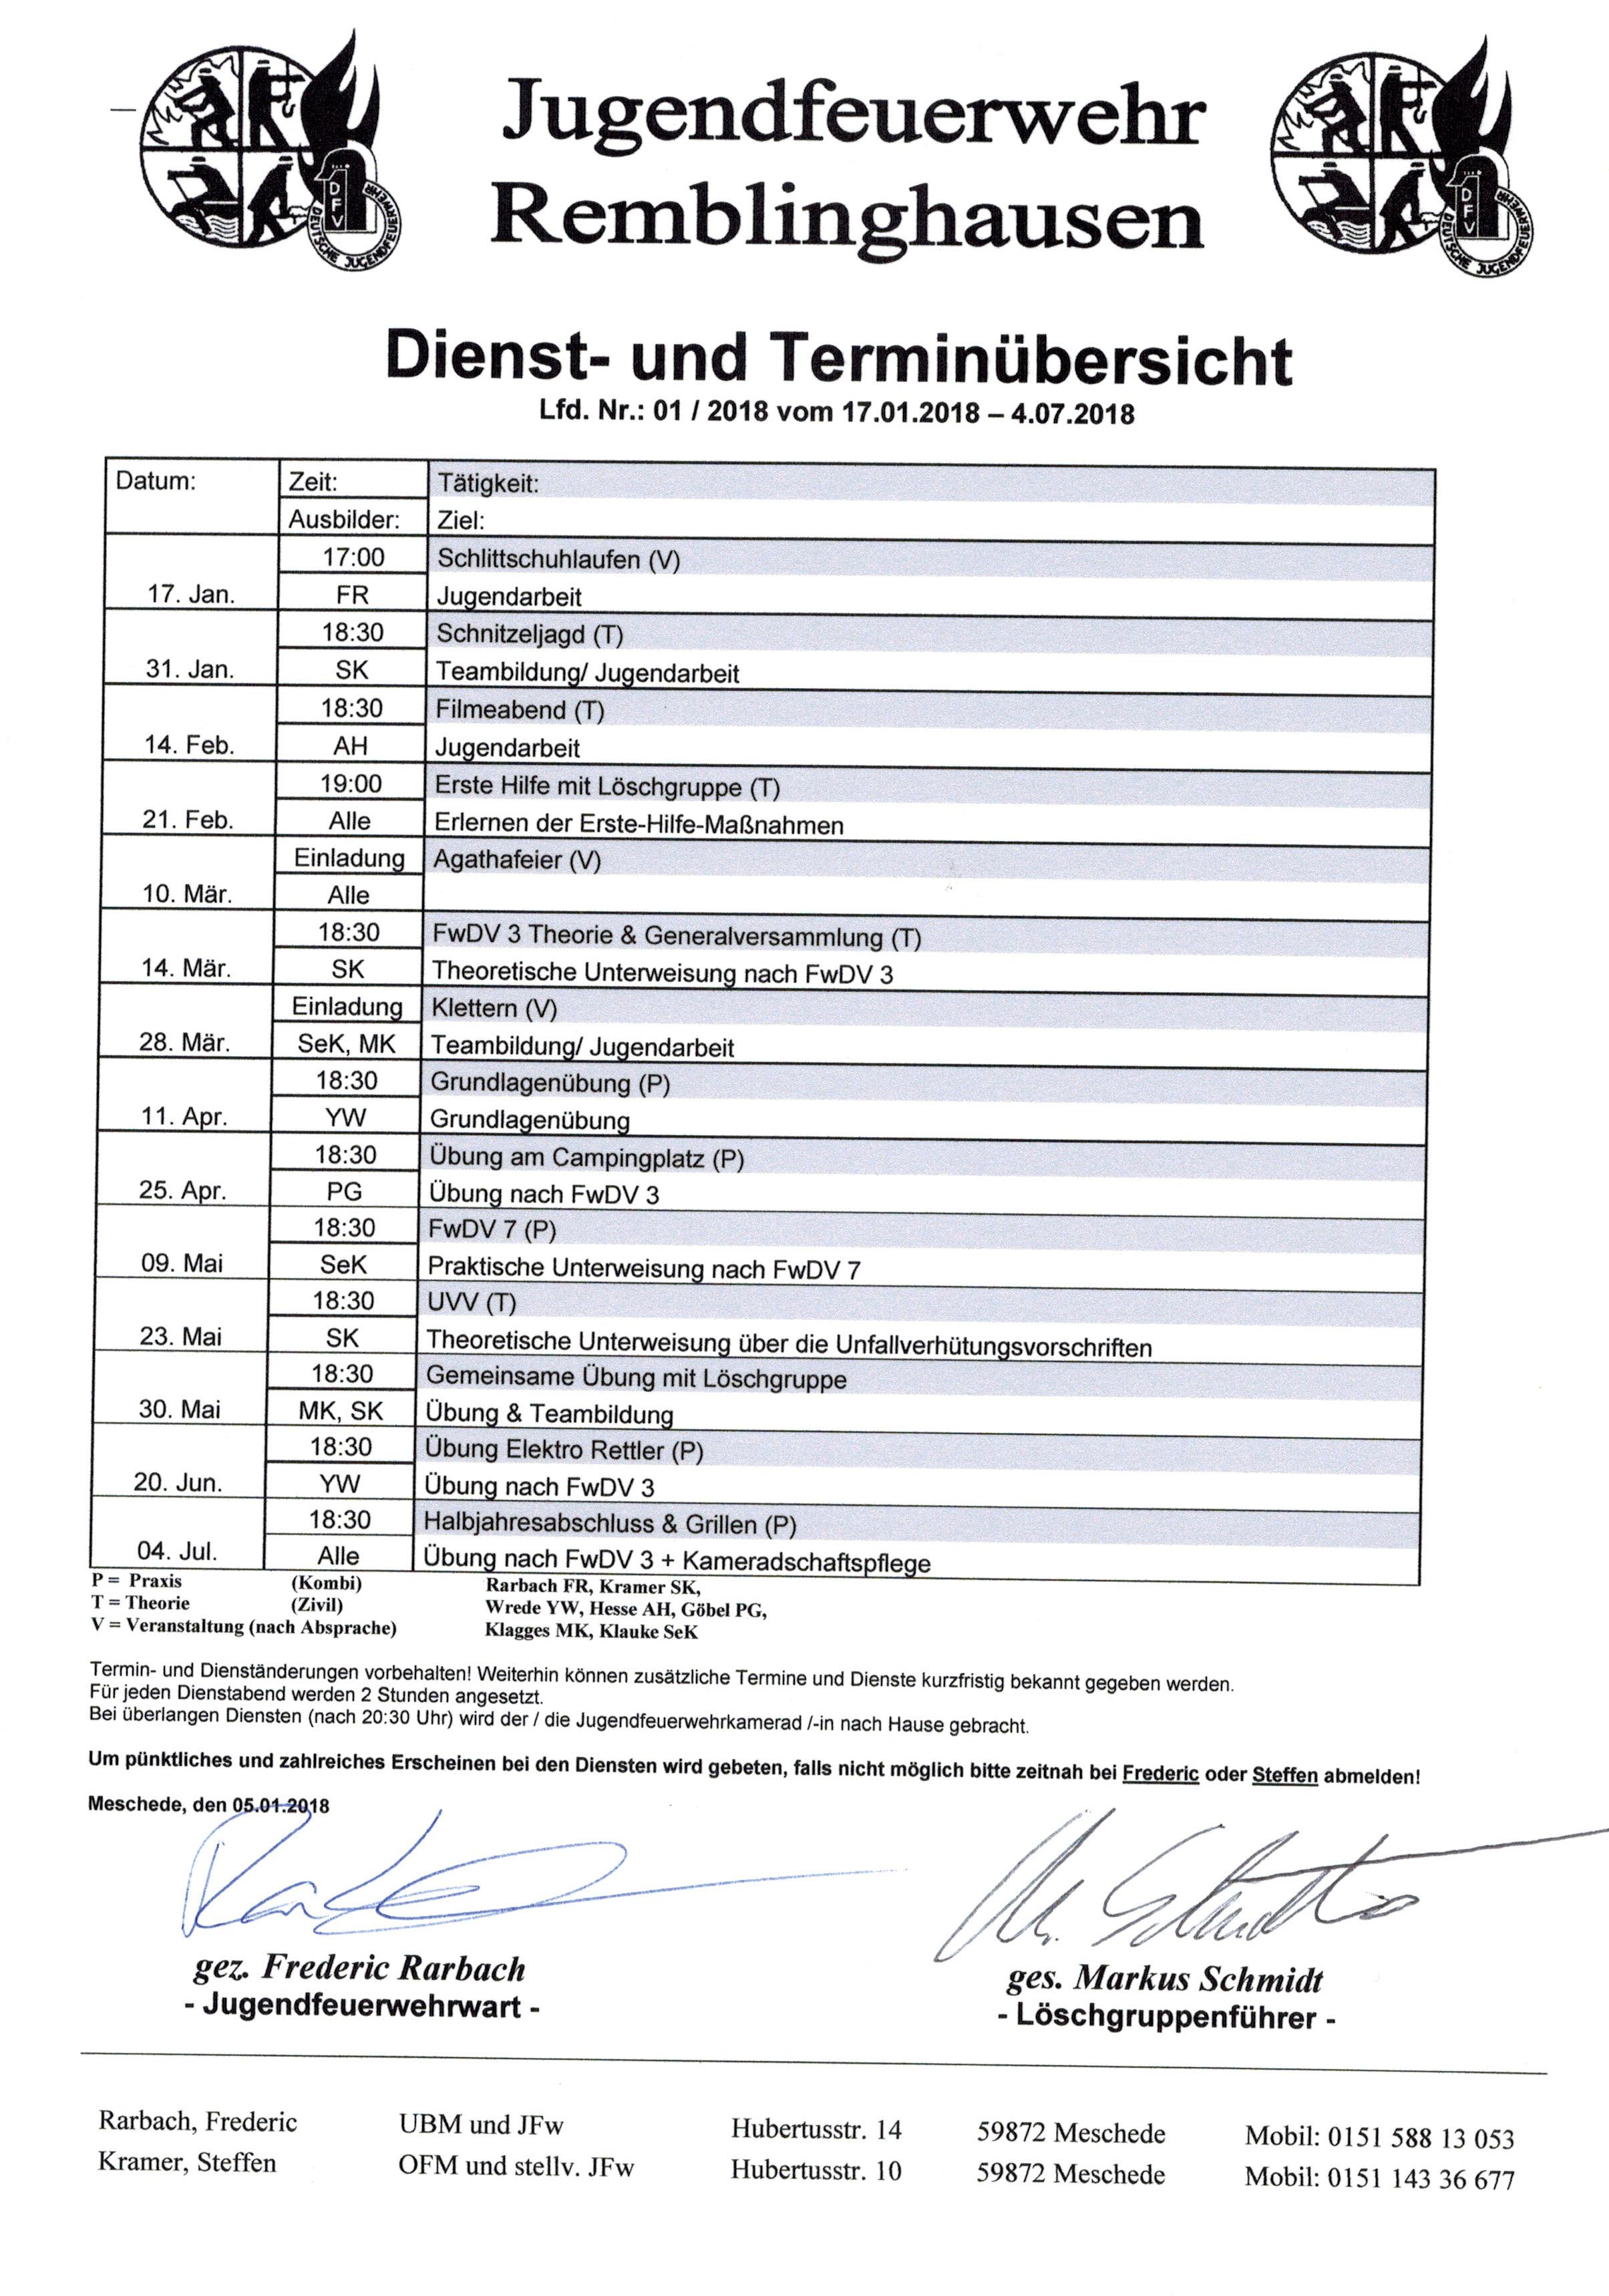 remblinghausen/Dienstplan_JF.jpg